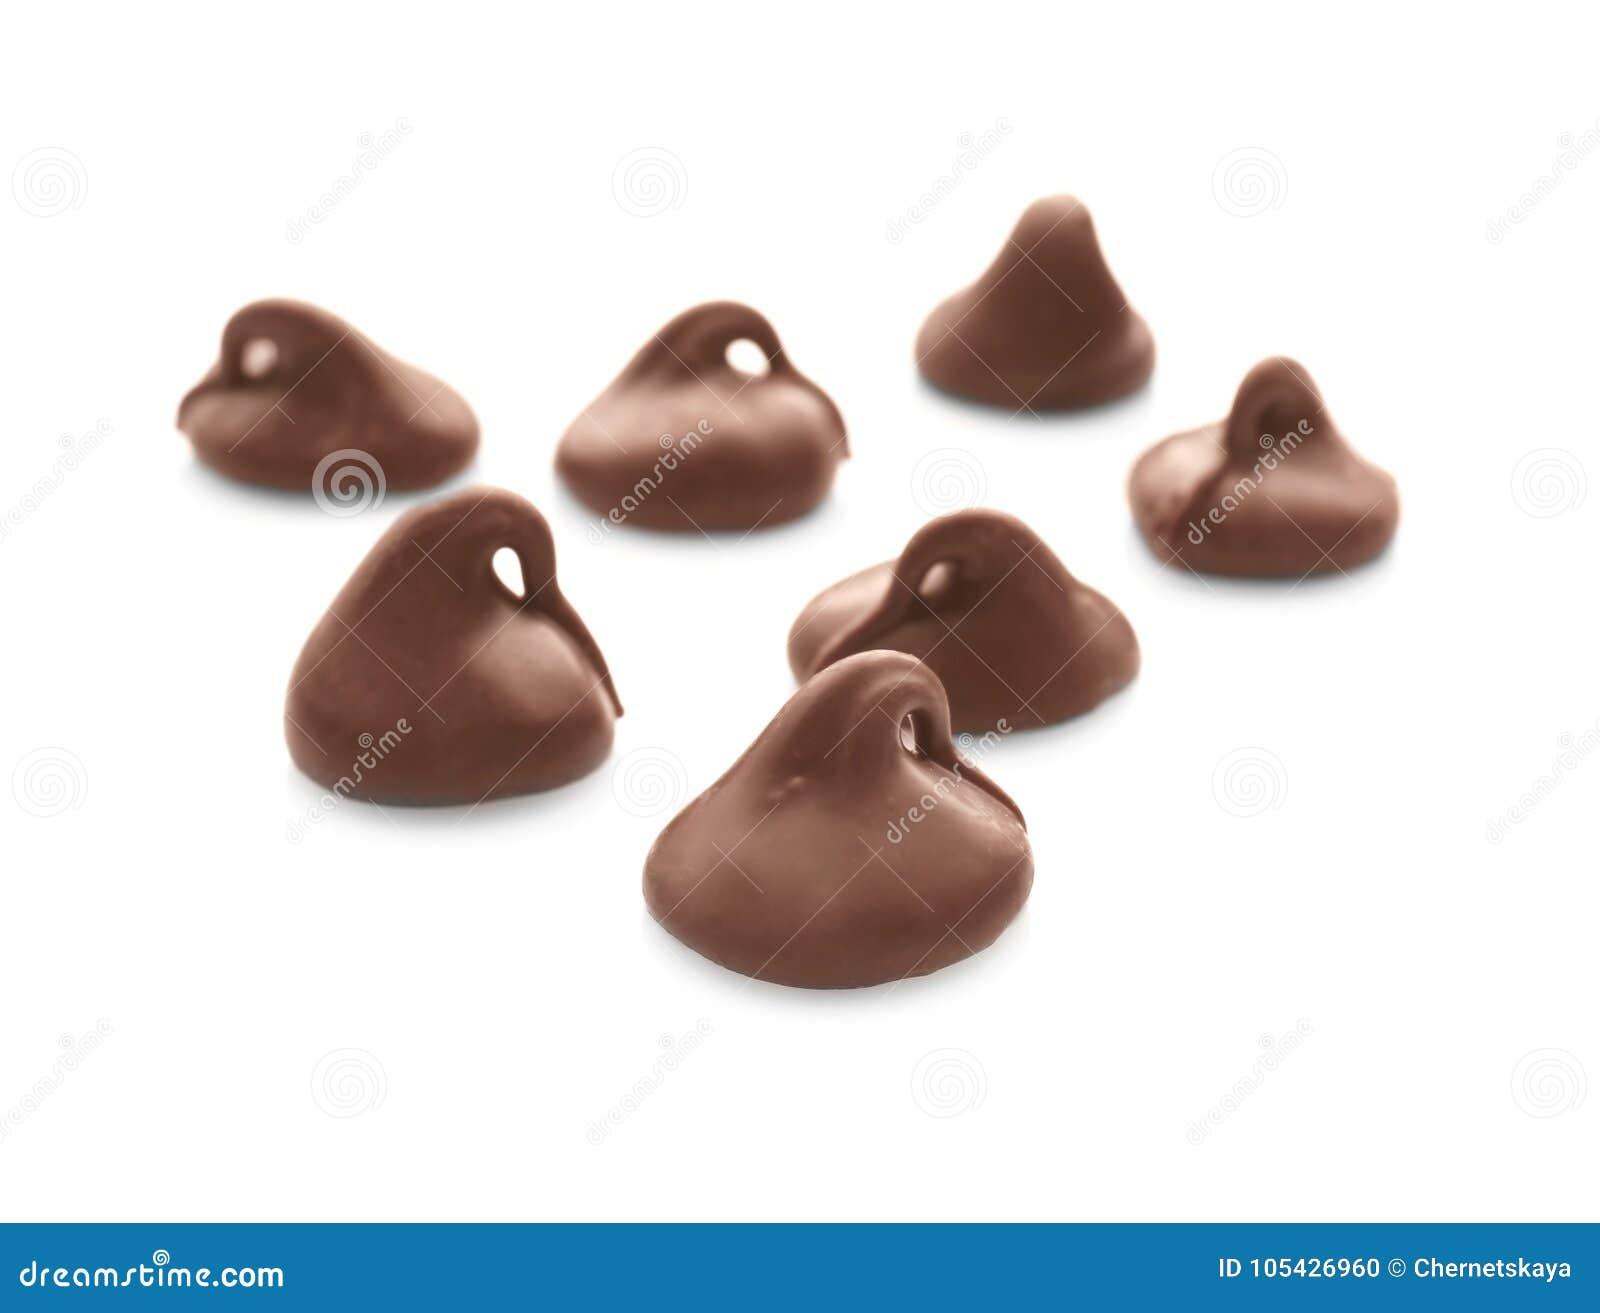 Tasty chocolate chips